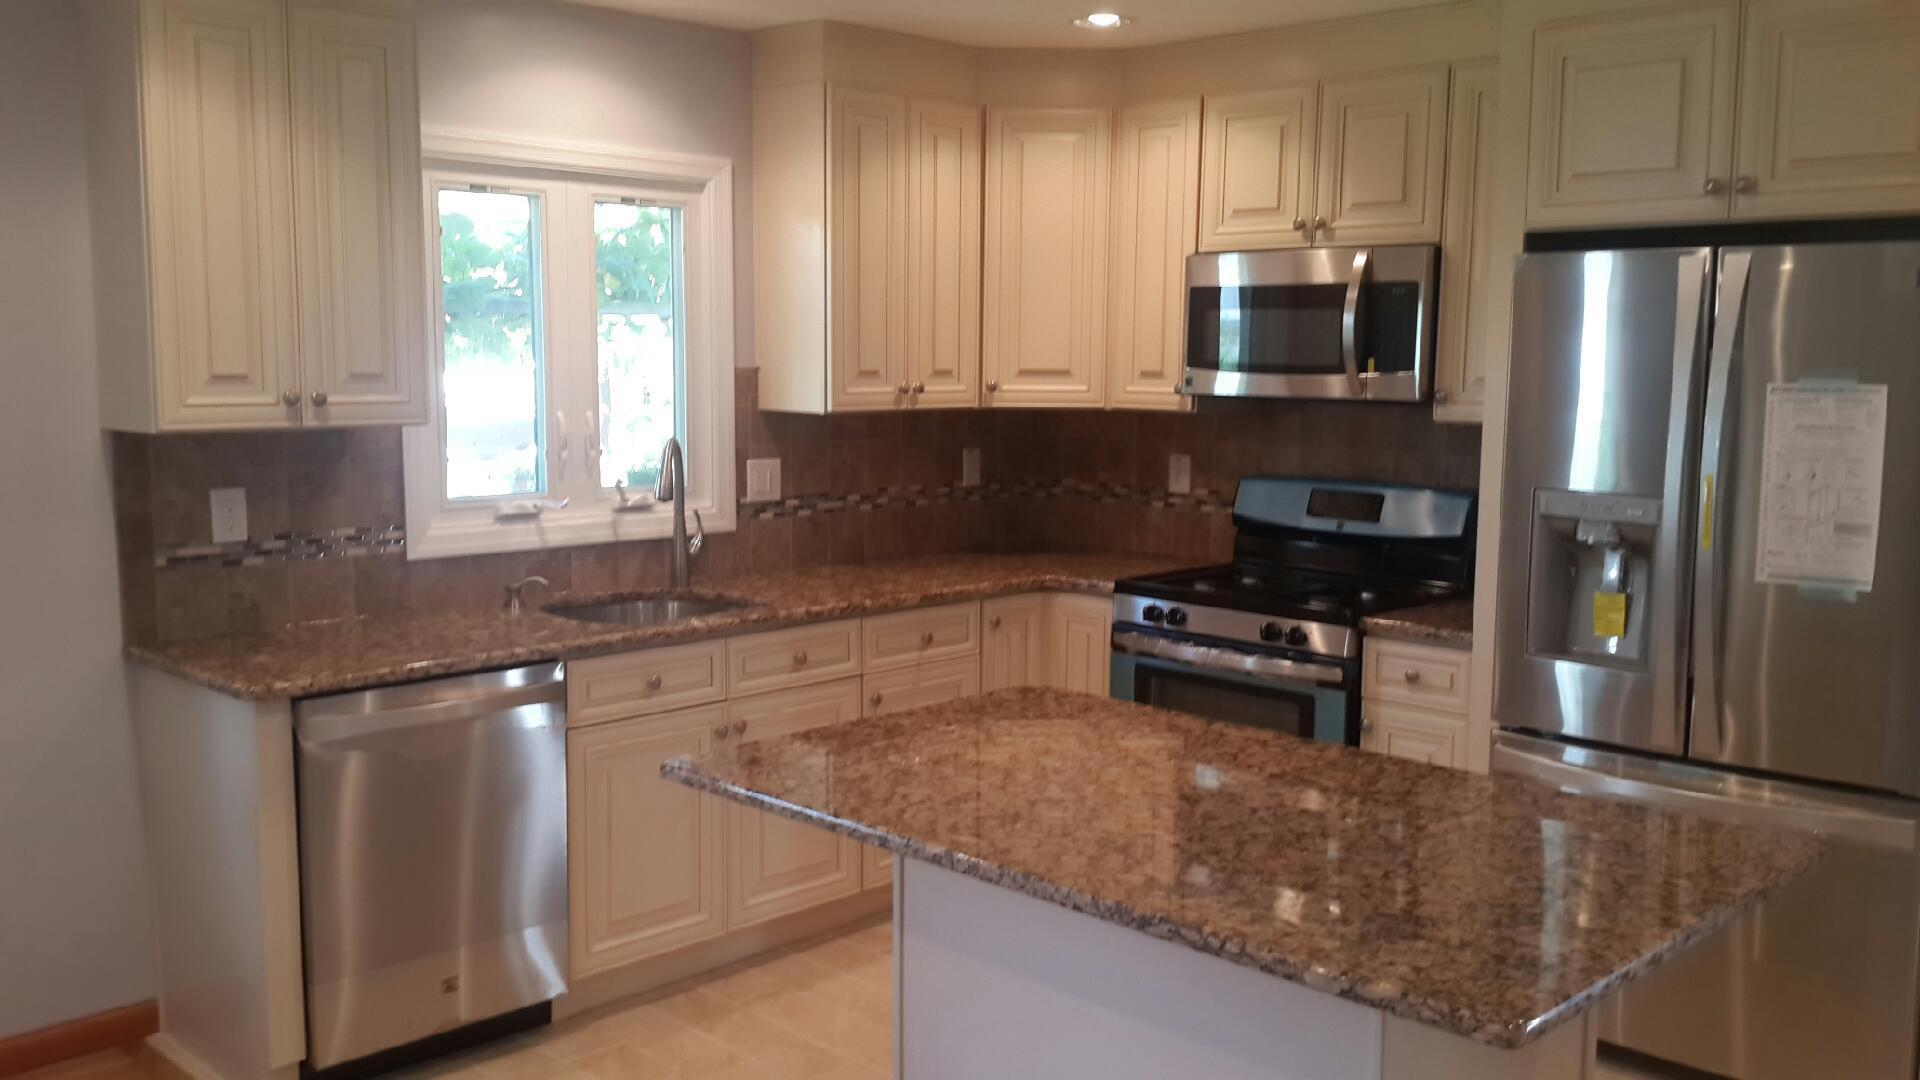 Kitchen remodel 4052